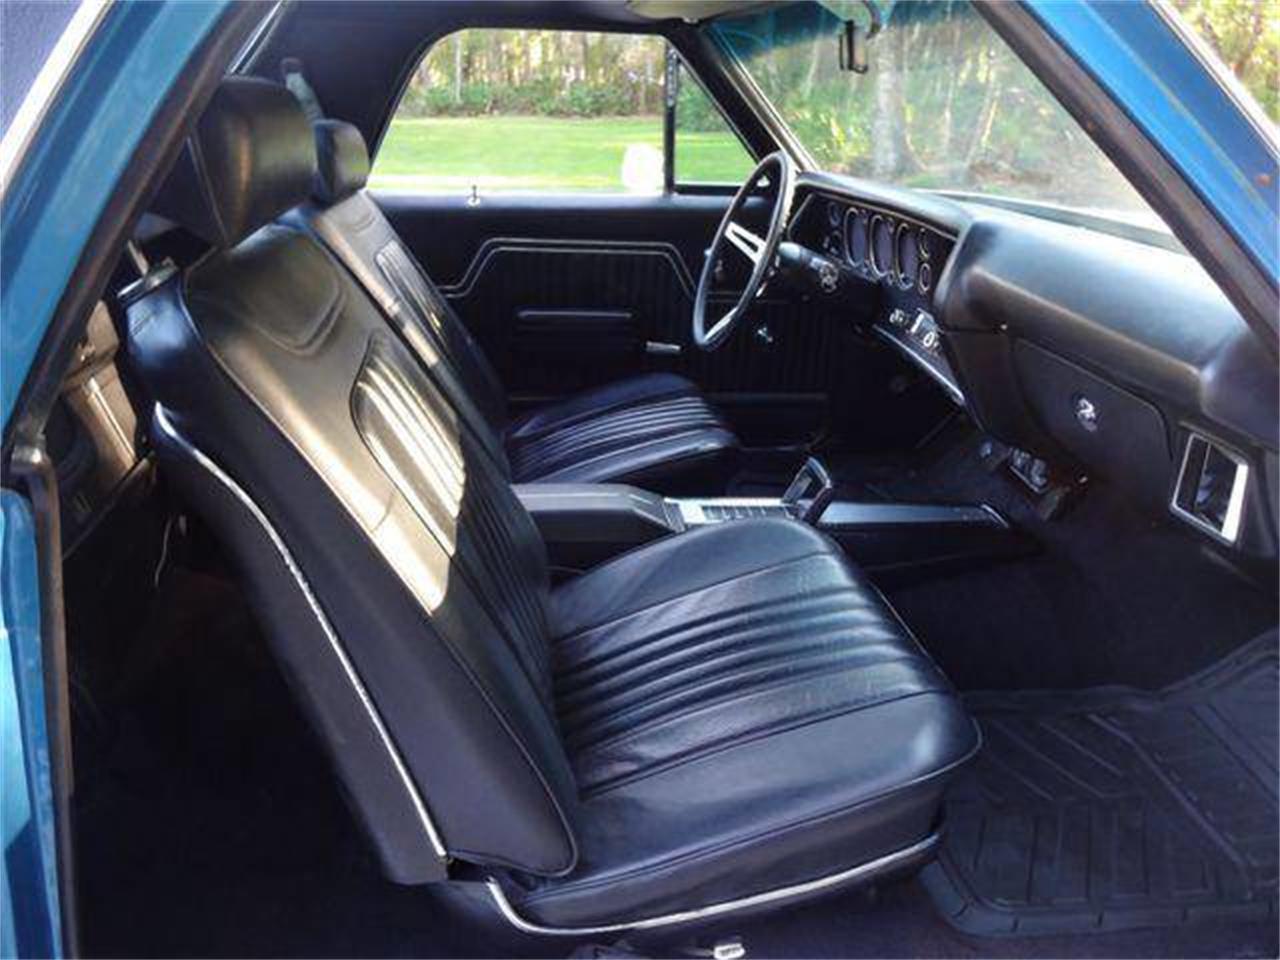 1971 Chevrolet El Camino (CC-1350392) for sale in Sarasota, Florida